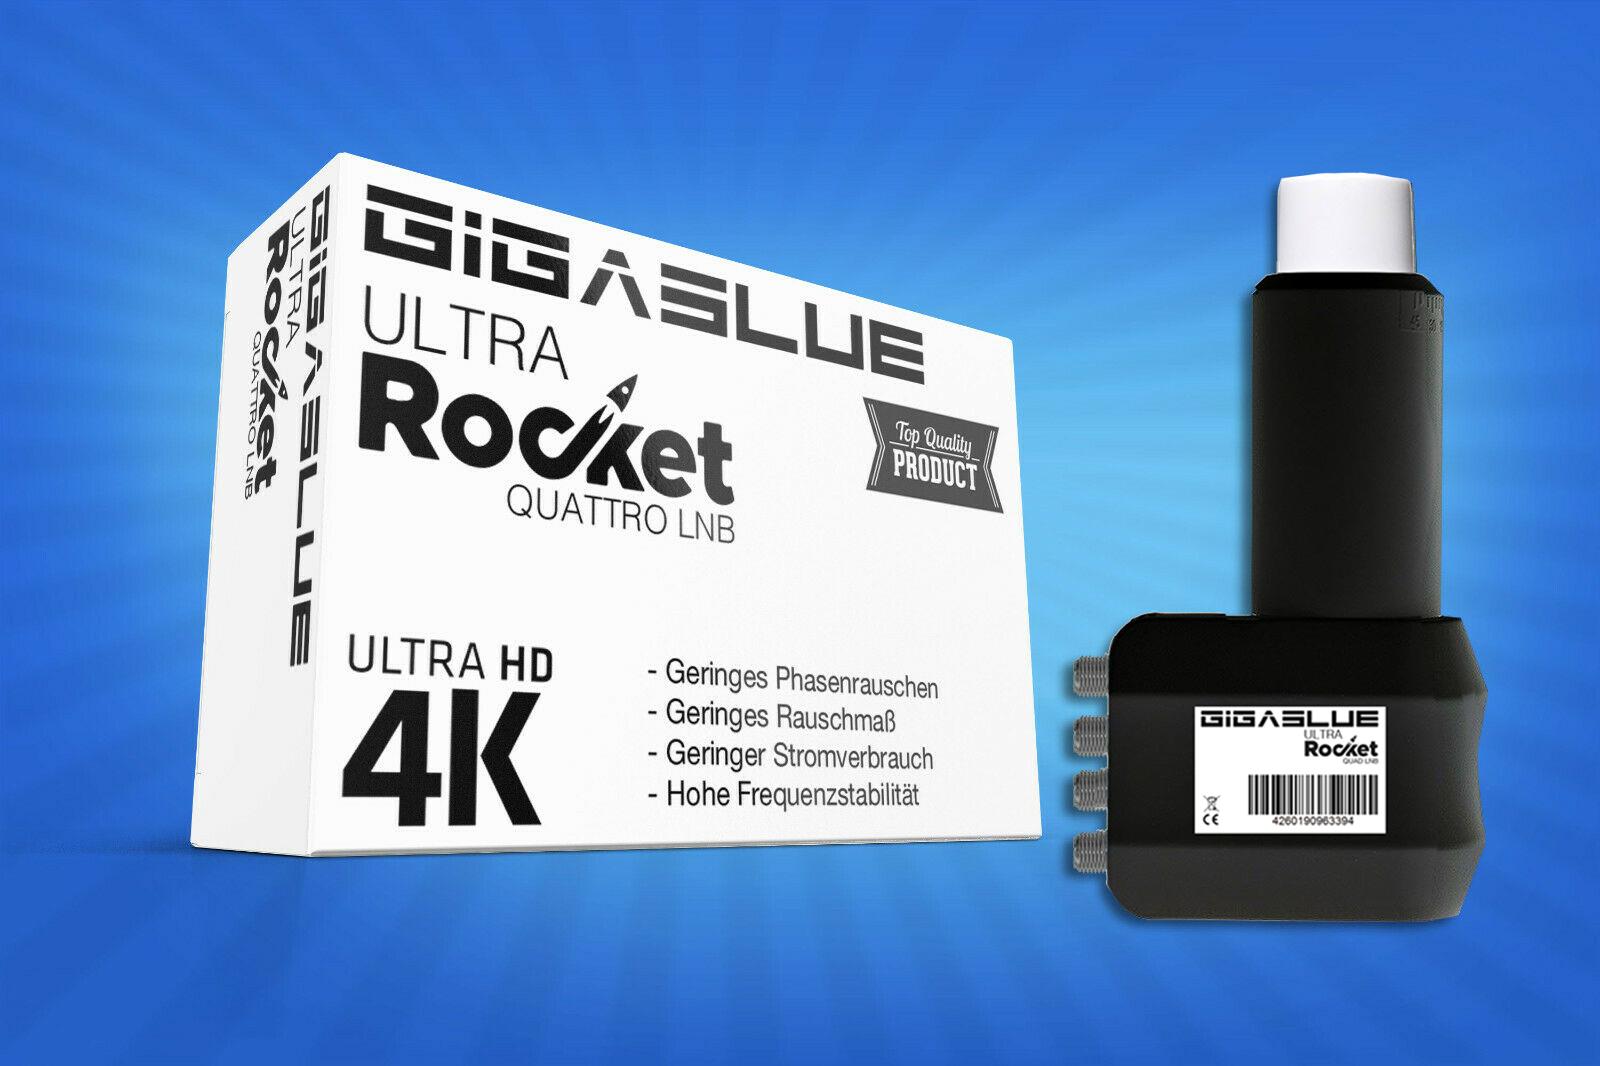 Gigablue Rocket Quad Multifeed LNB 40mm Feed 0.1dB Full HD